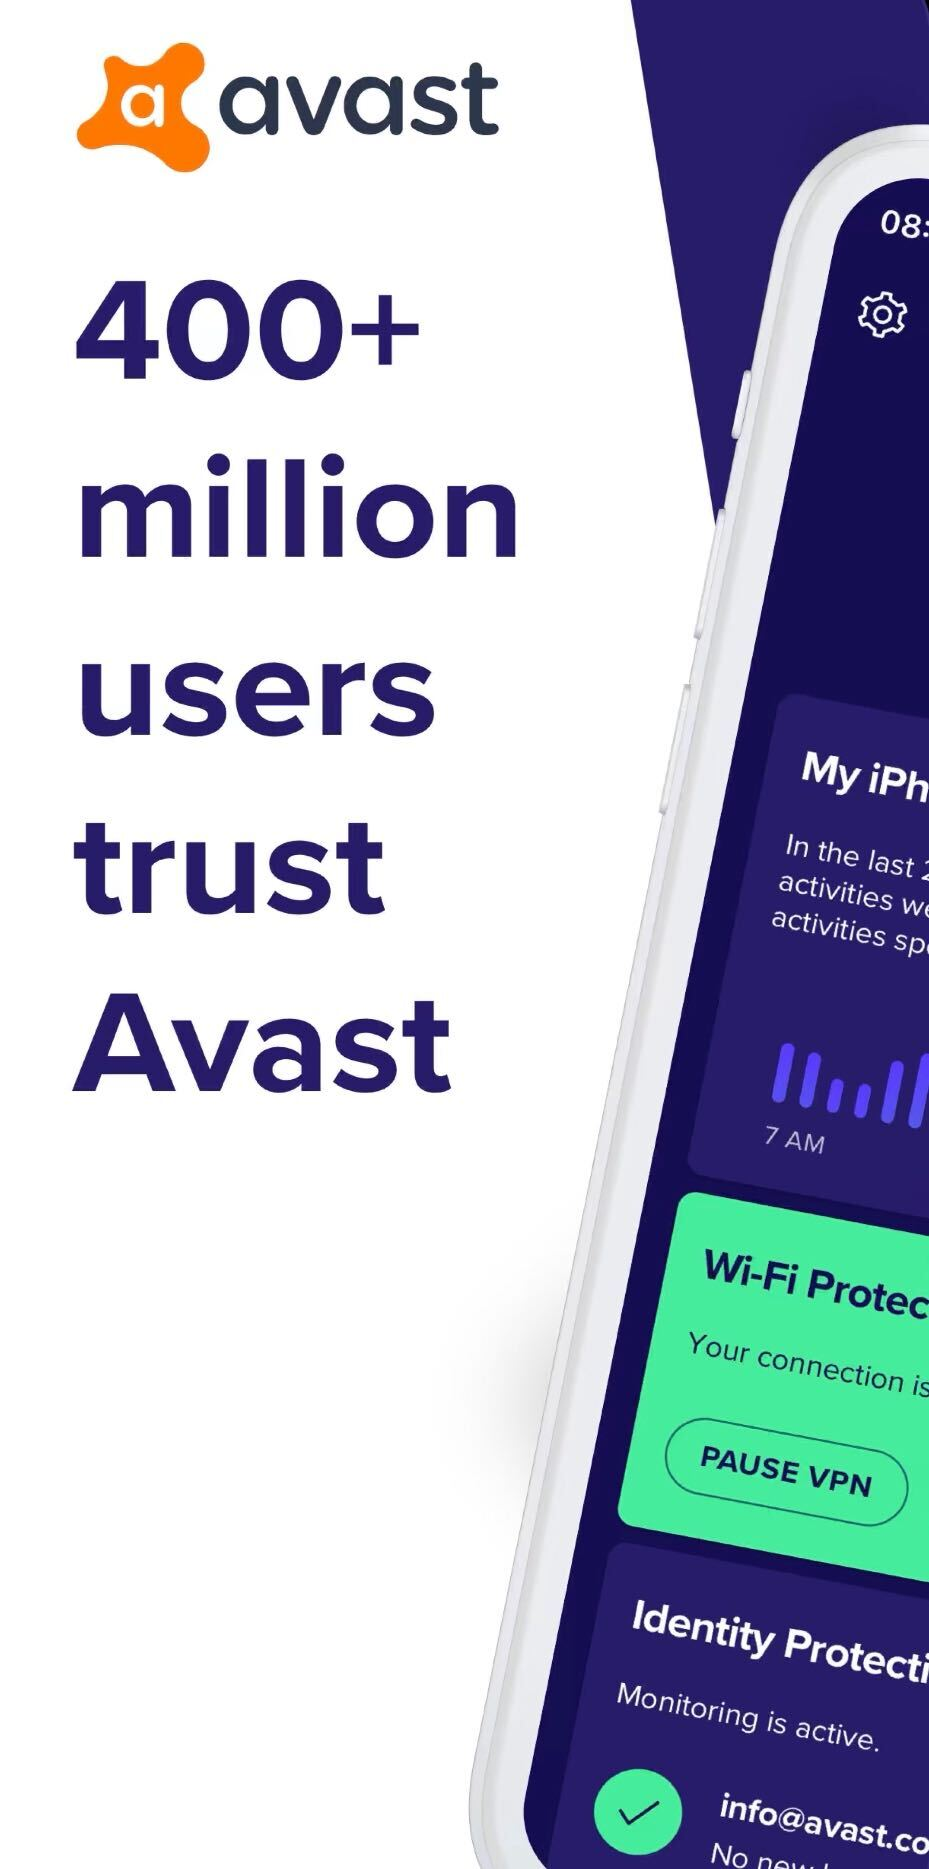 Product Avast